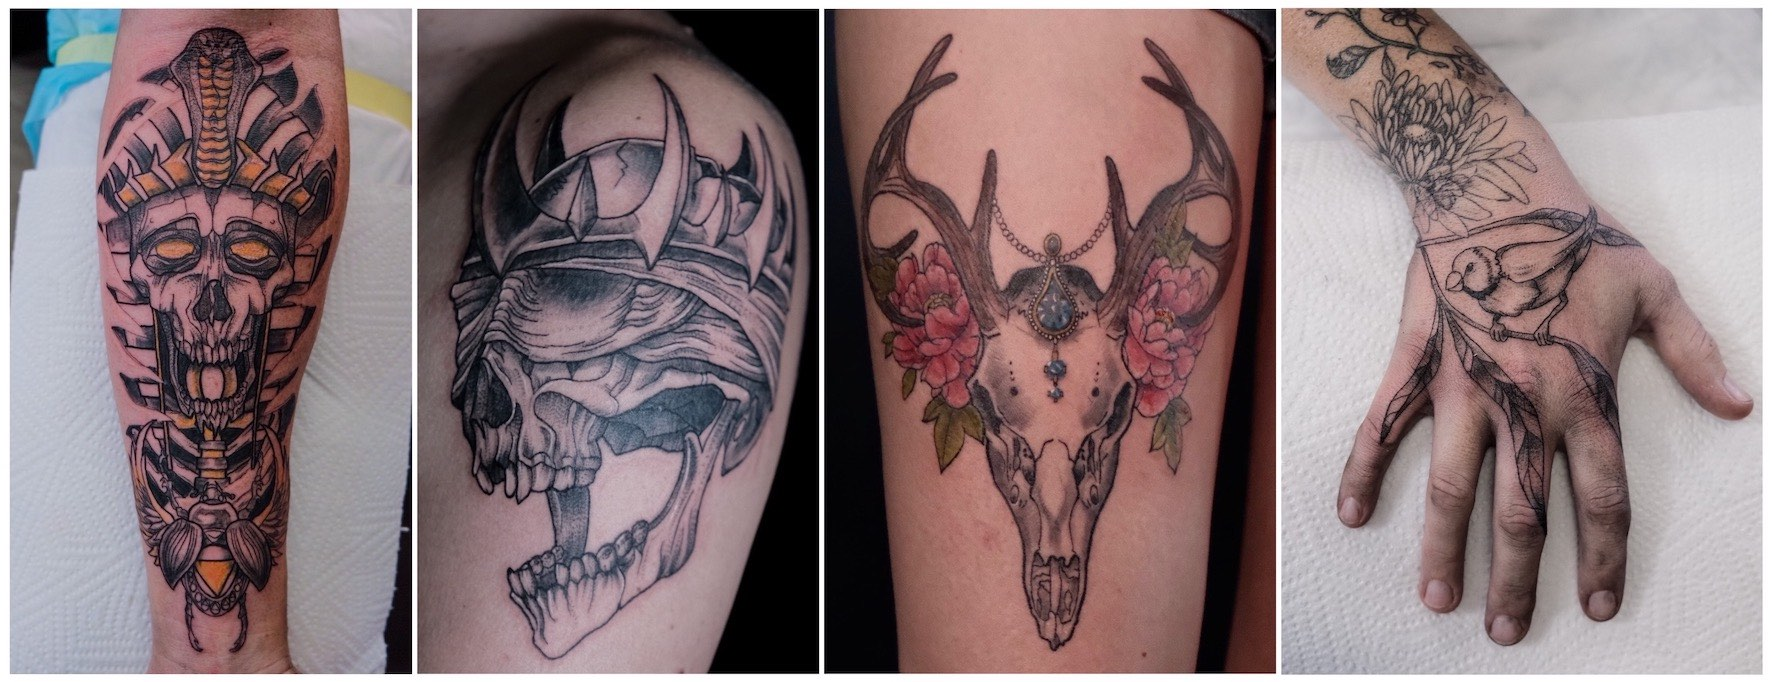 Tattoos by Nathan Ferreira